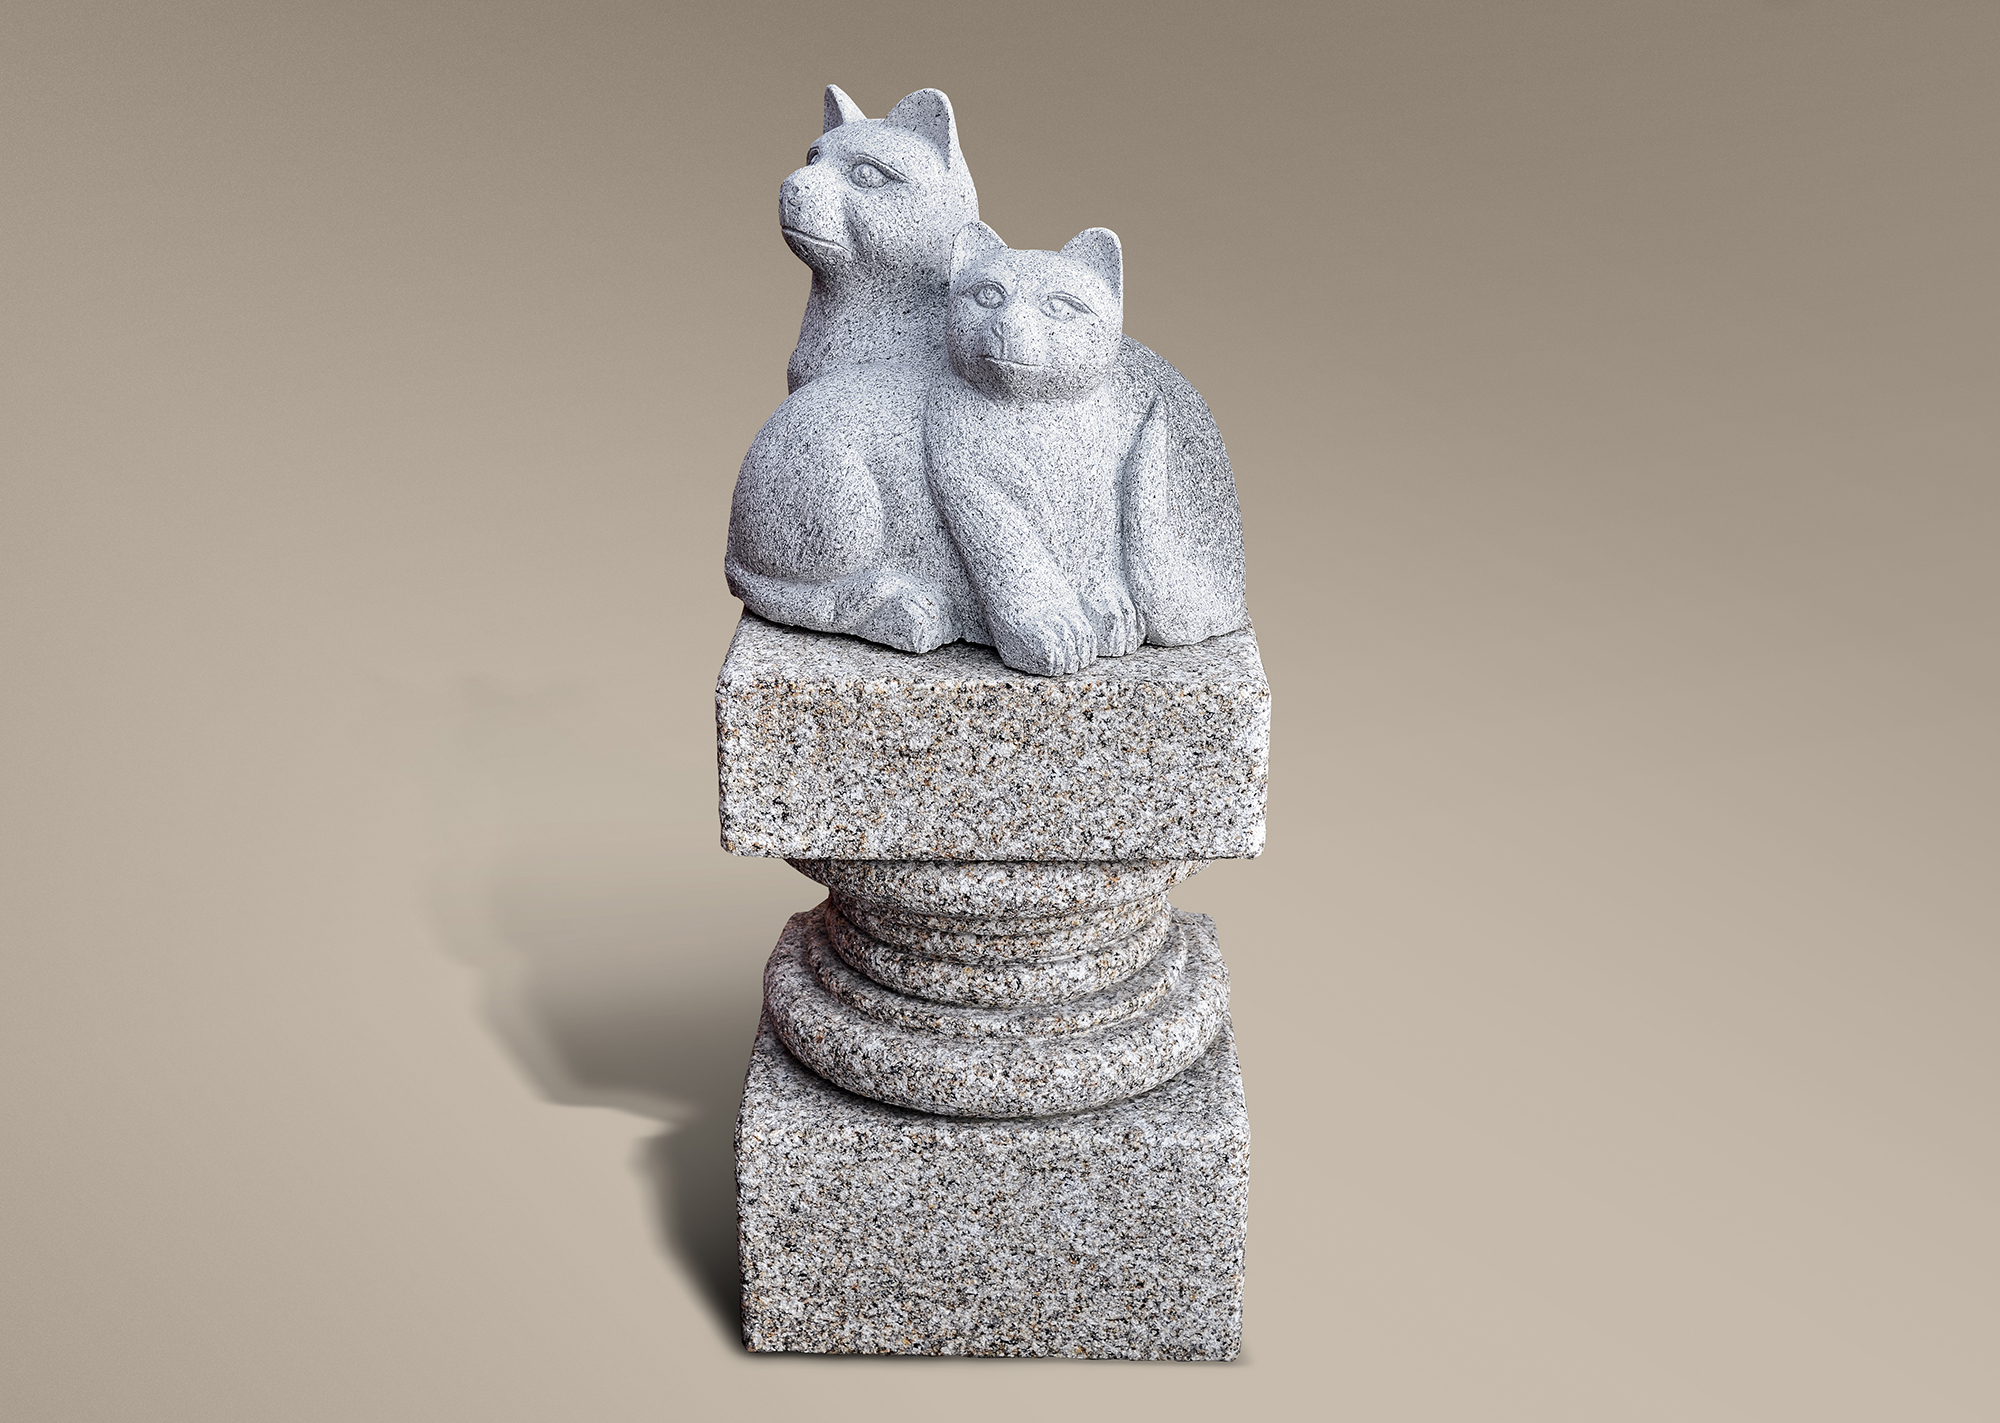 Gatos sobre pedestal